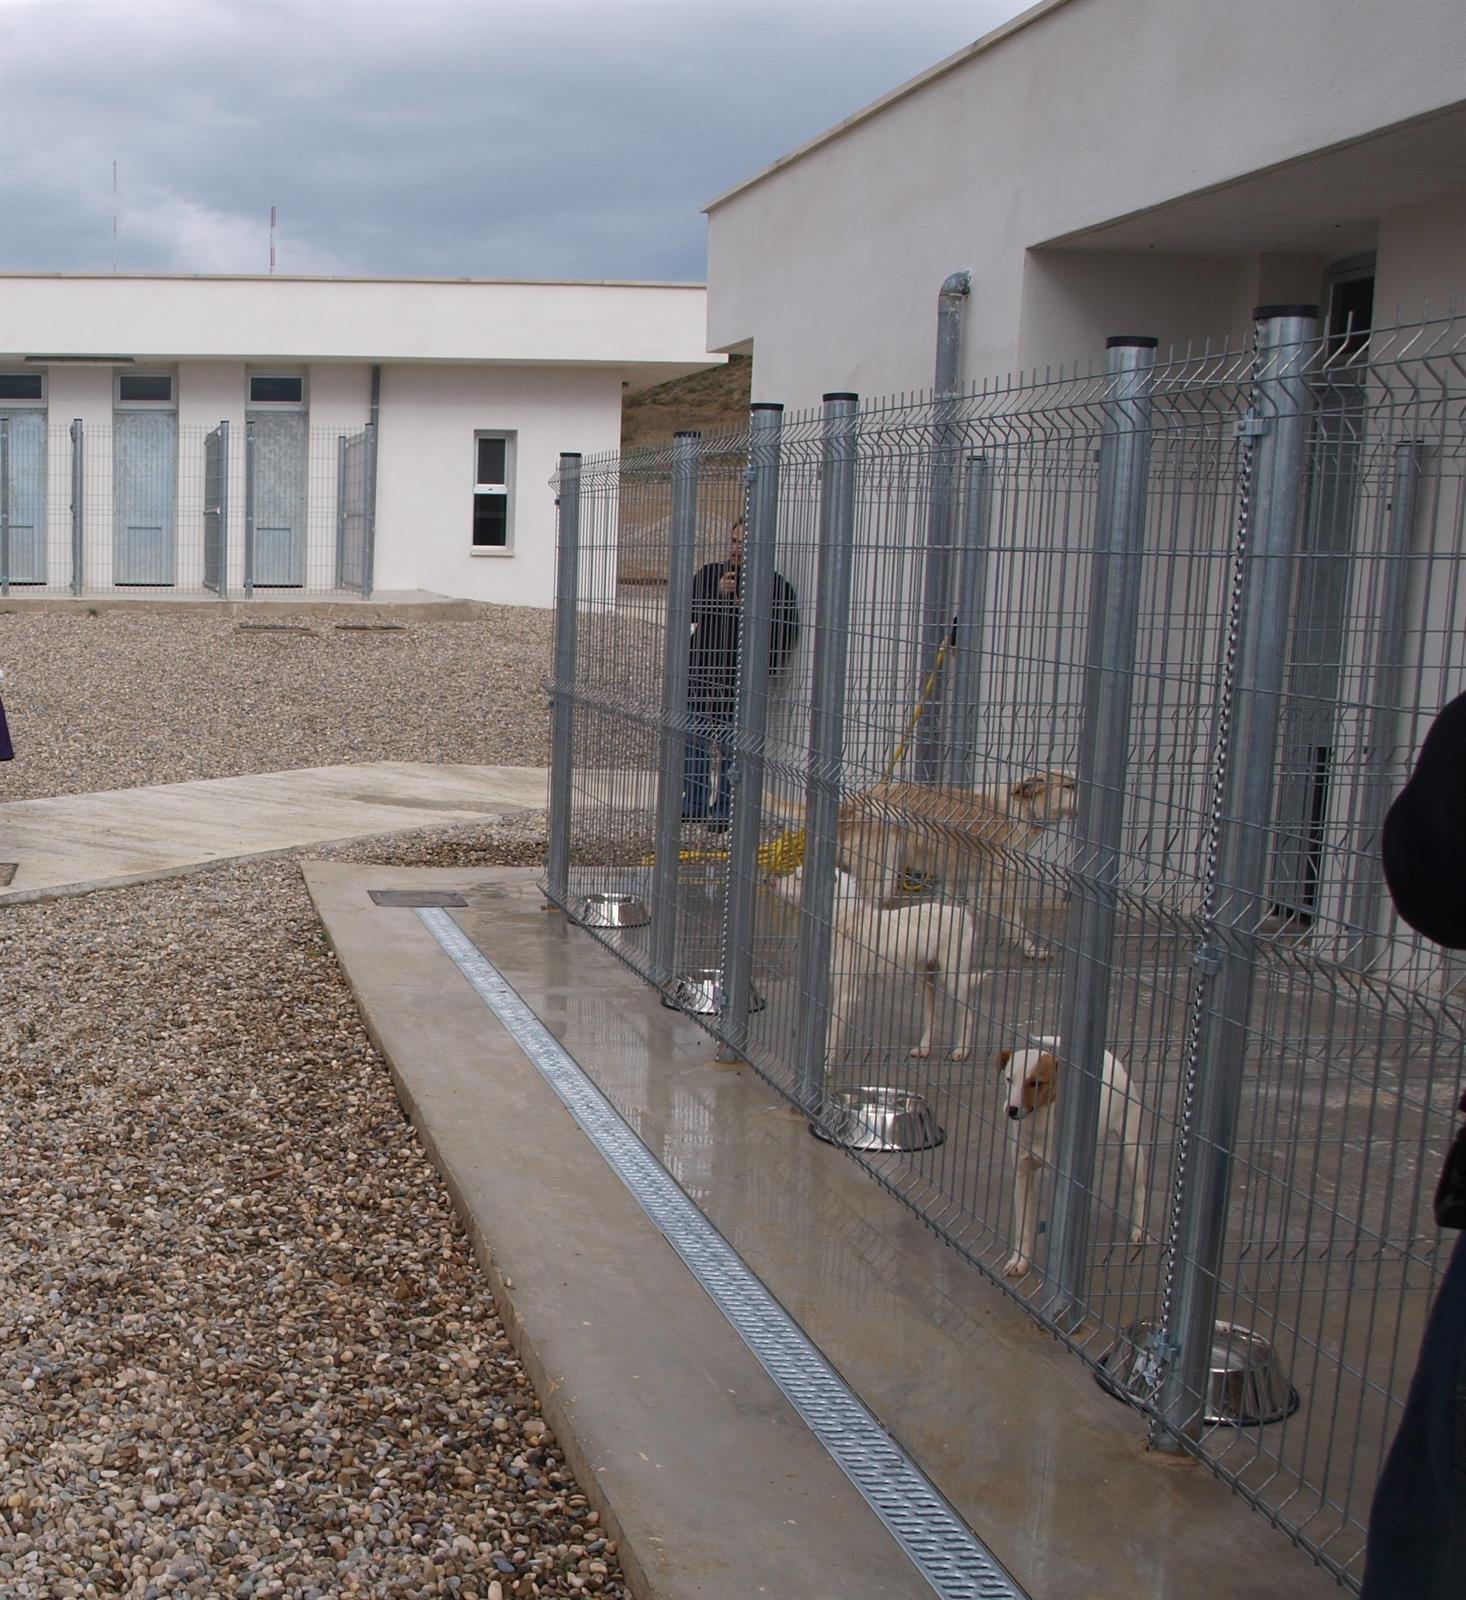 Centro de acogida de animales badajoz